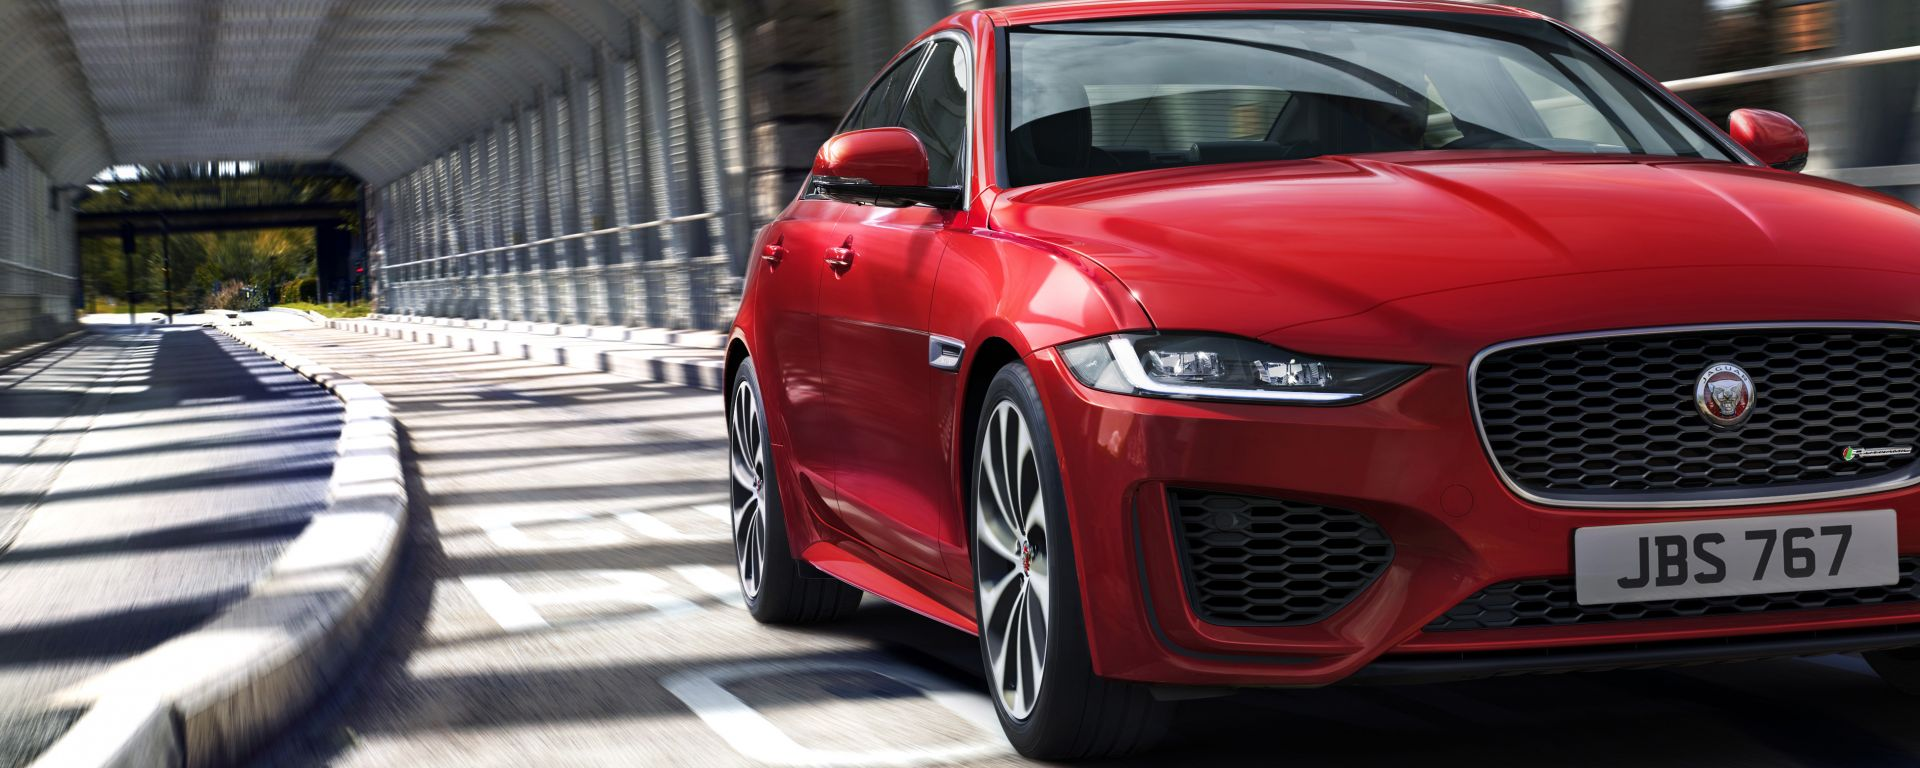 Nuova Jaguar XE 2019, cambia look la berlina del Giaguaro